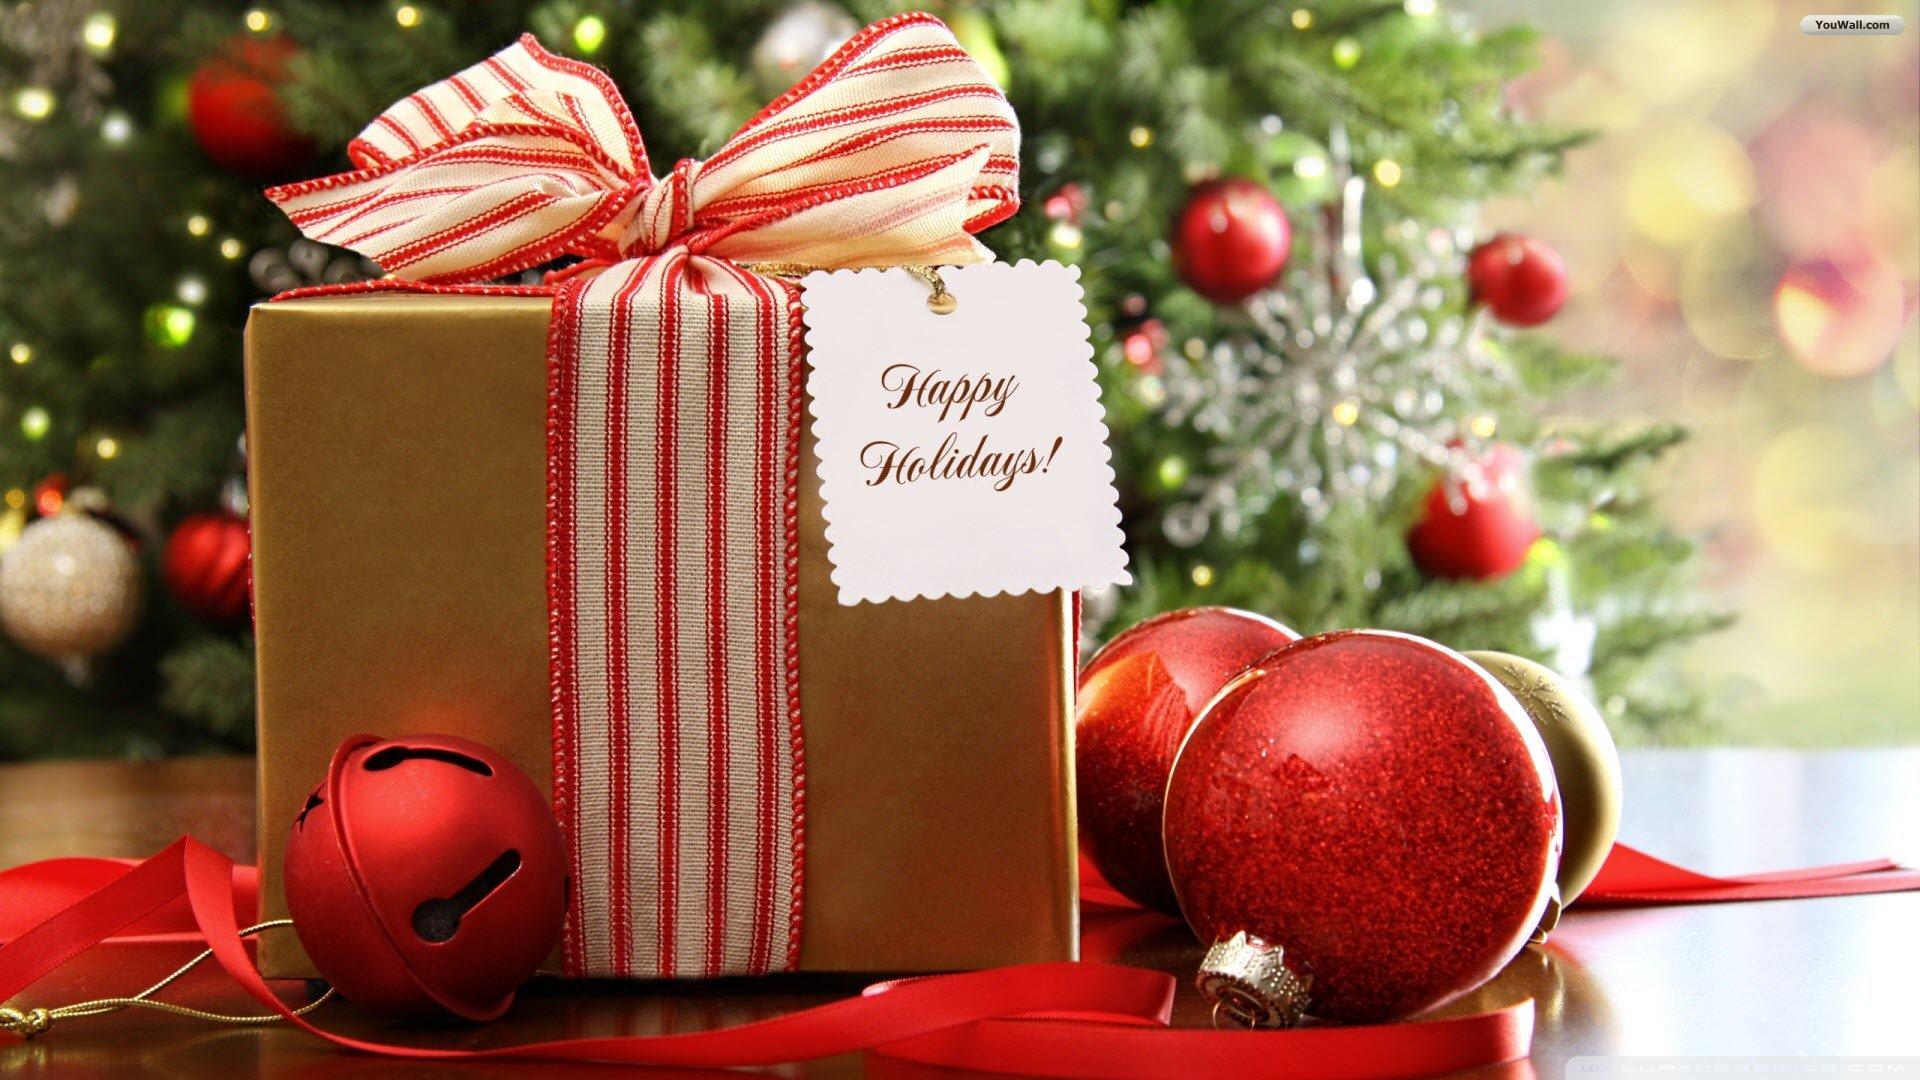 Christmas Gift Wallpaper 1920x1080 320 KB 1920x1080